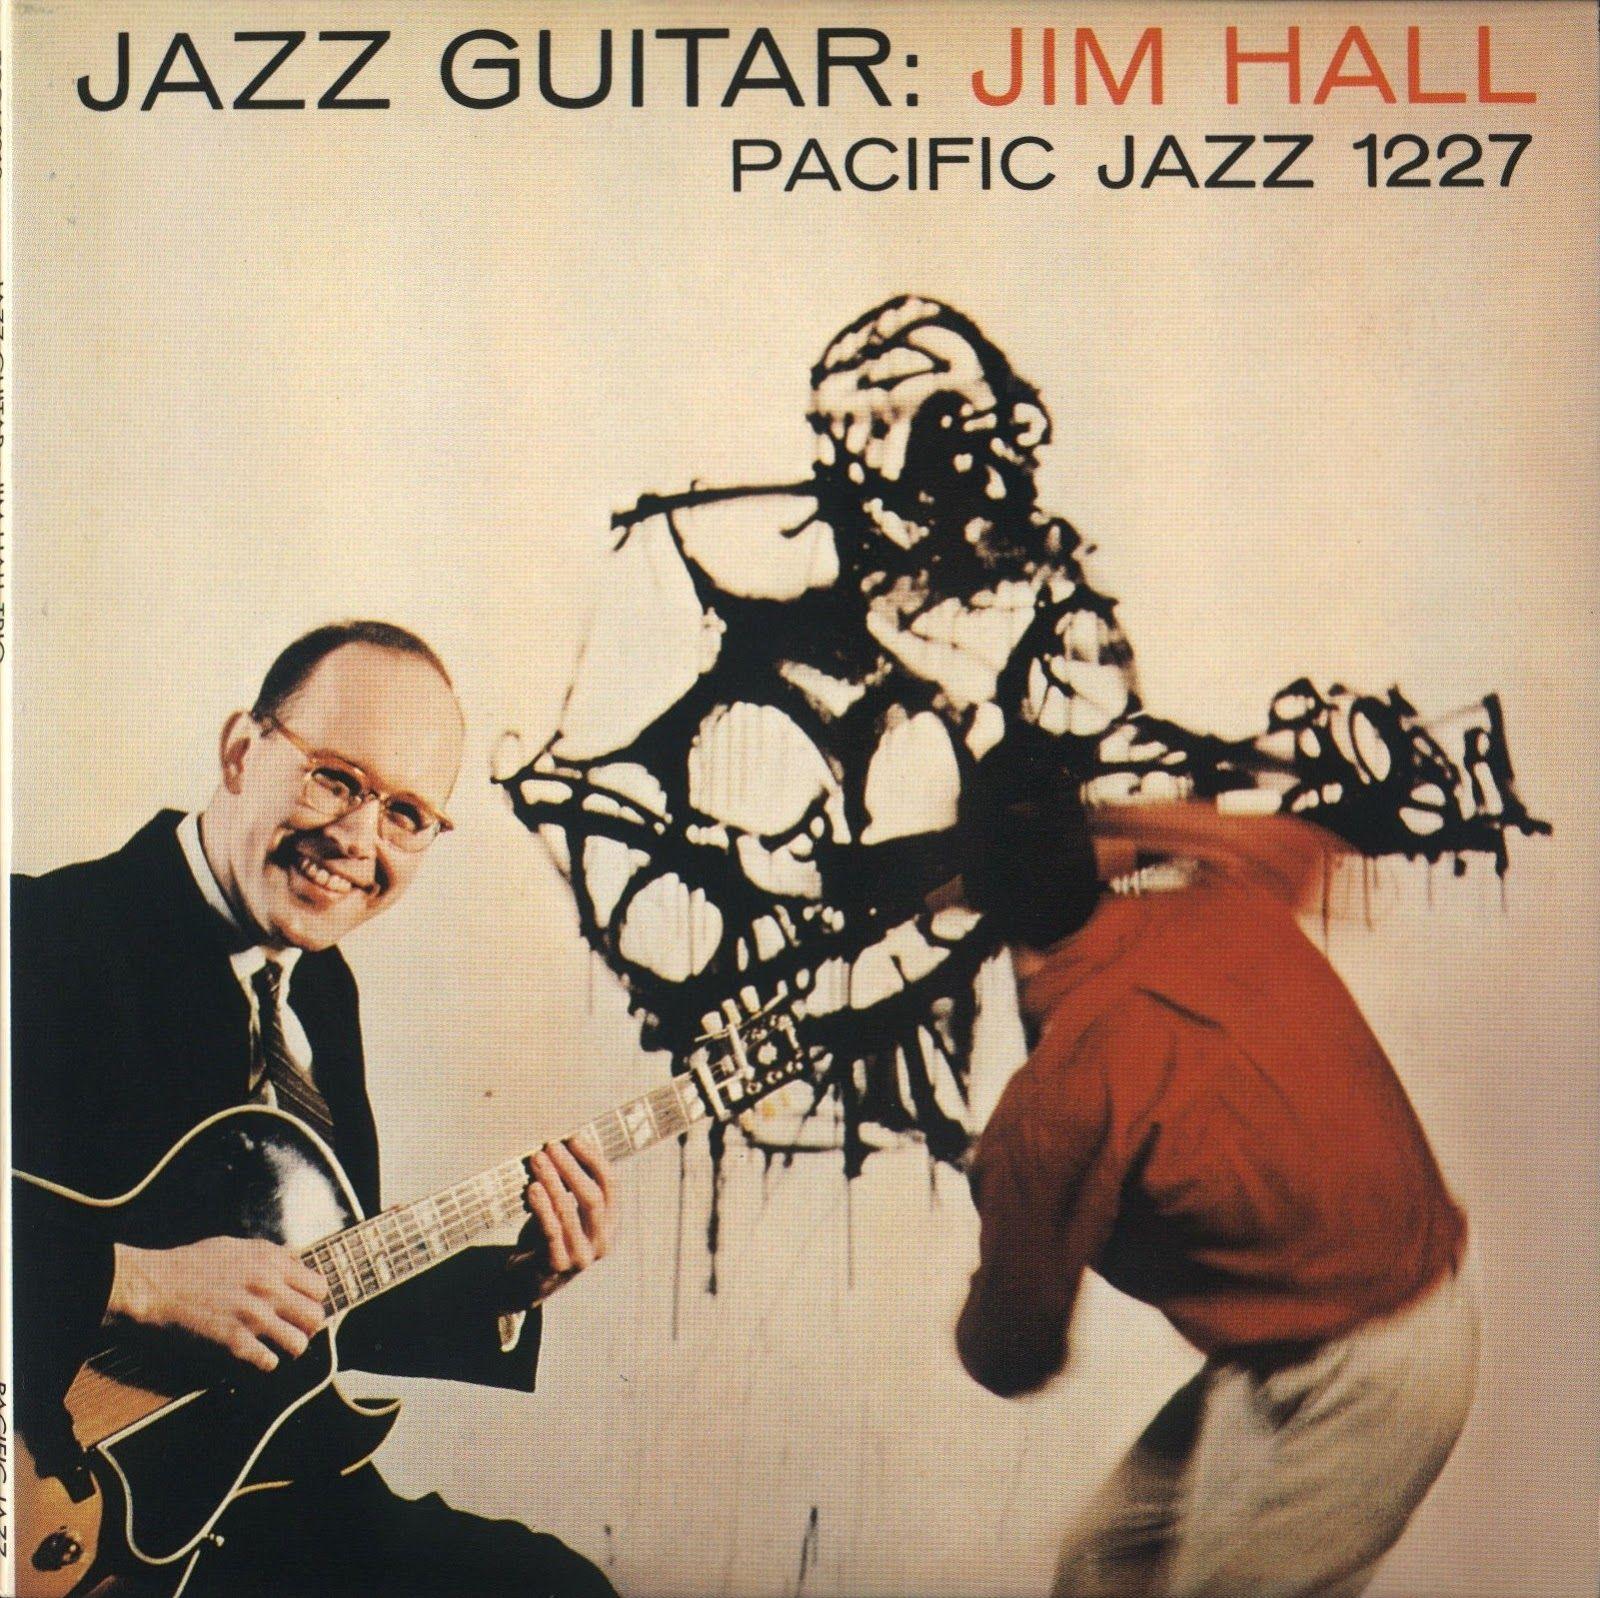 Happy Birthday Jim Hall - So What's Your Favorite JH Album?-jim-hall-jazz-guitar-copy-jpg